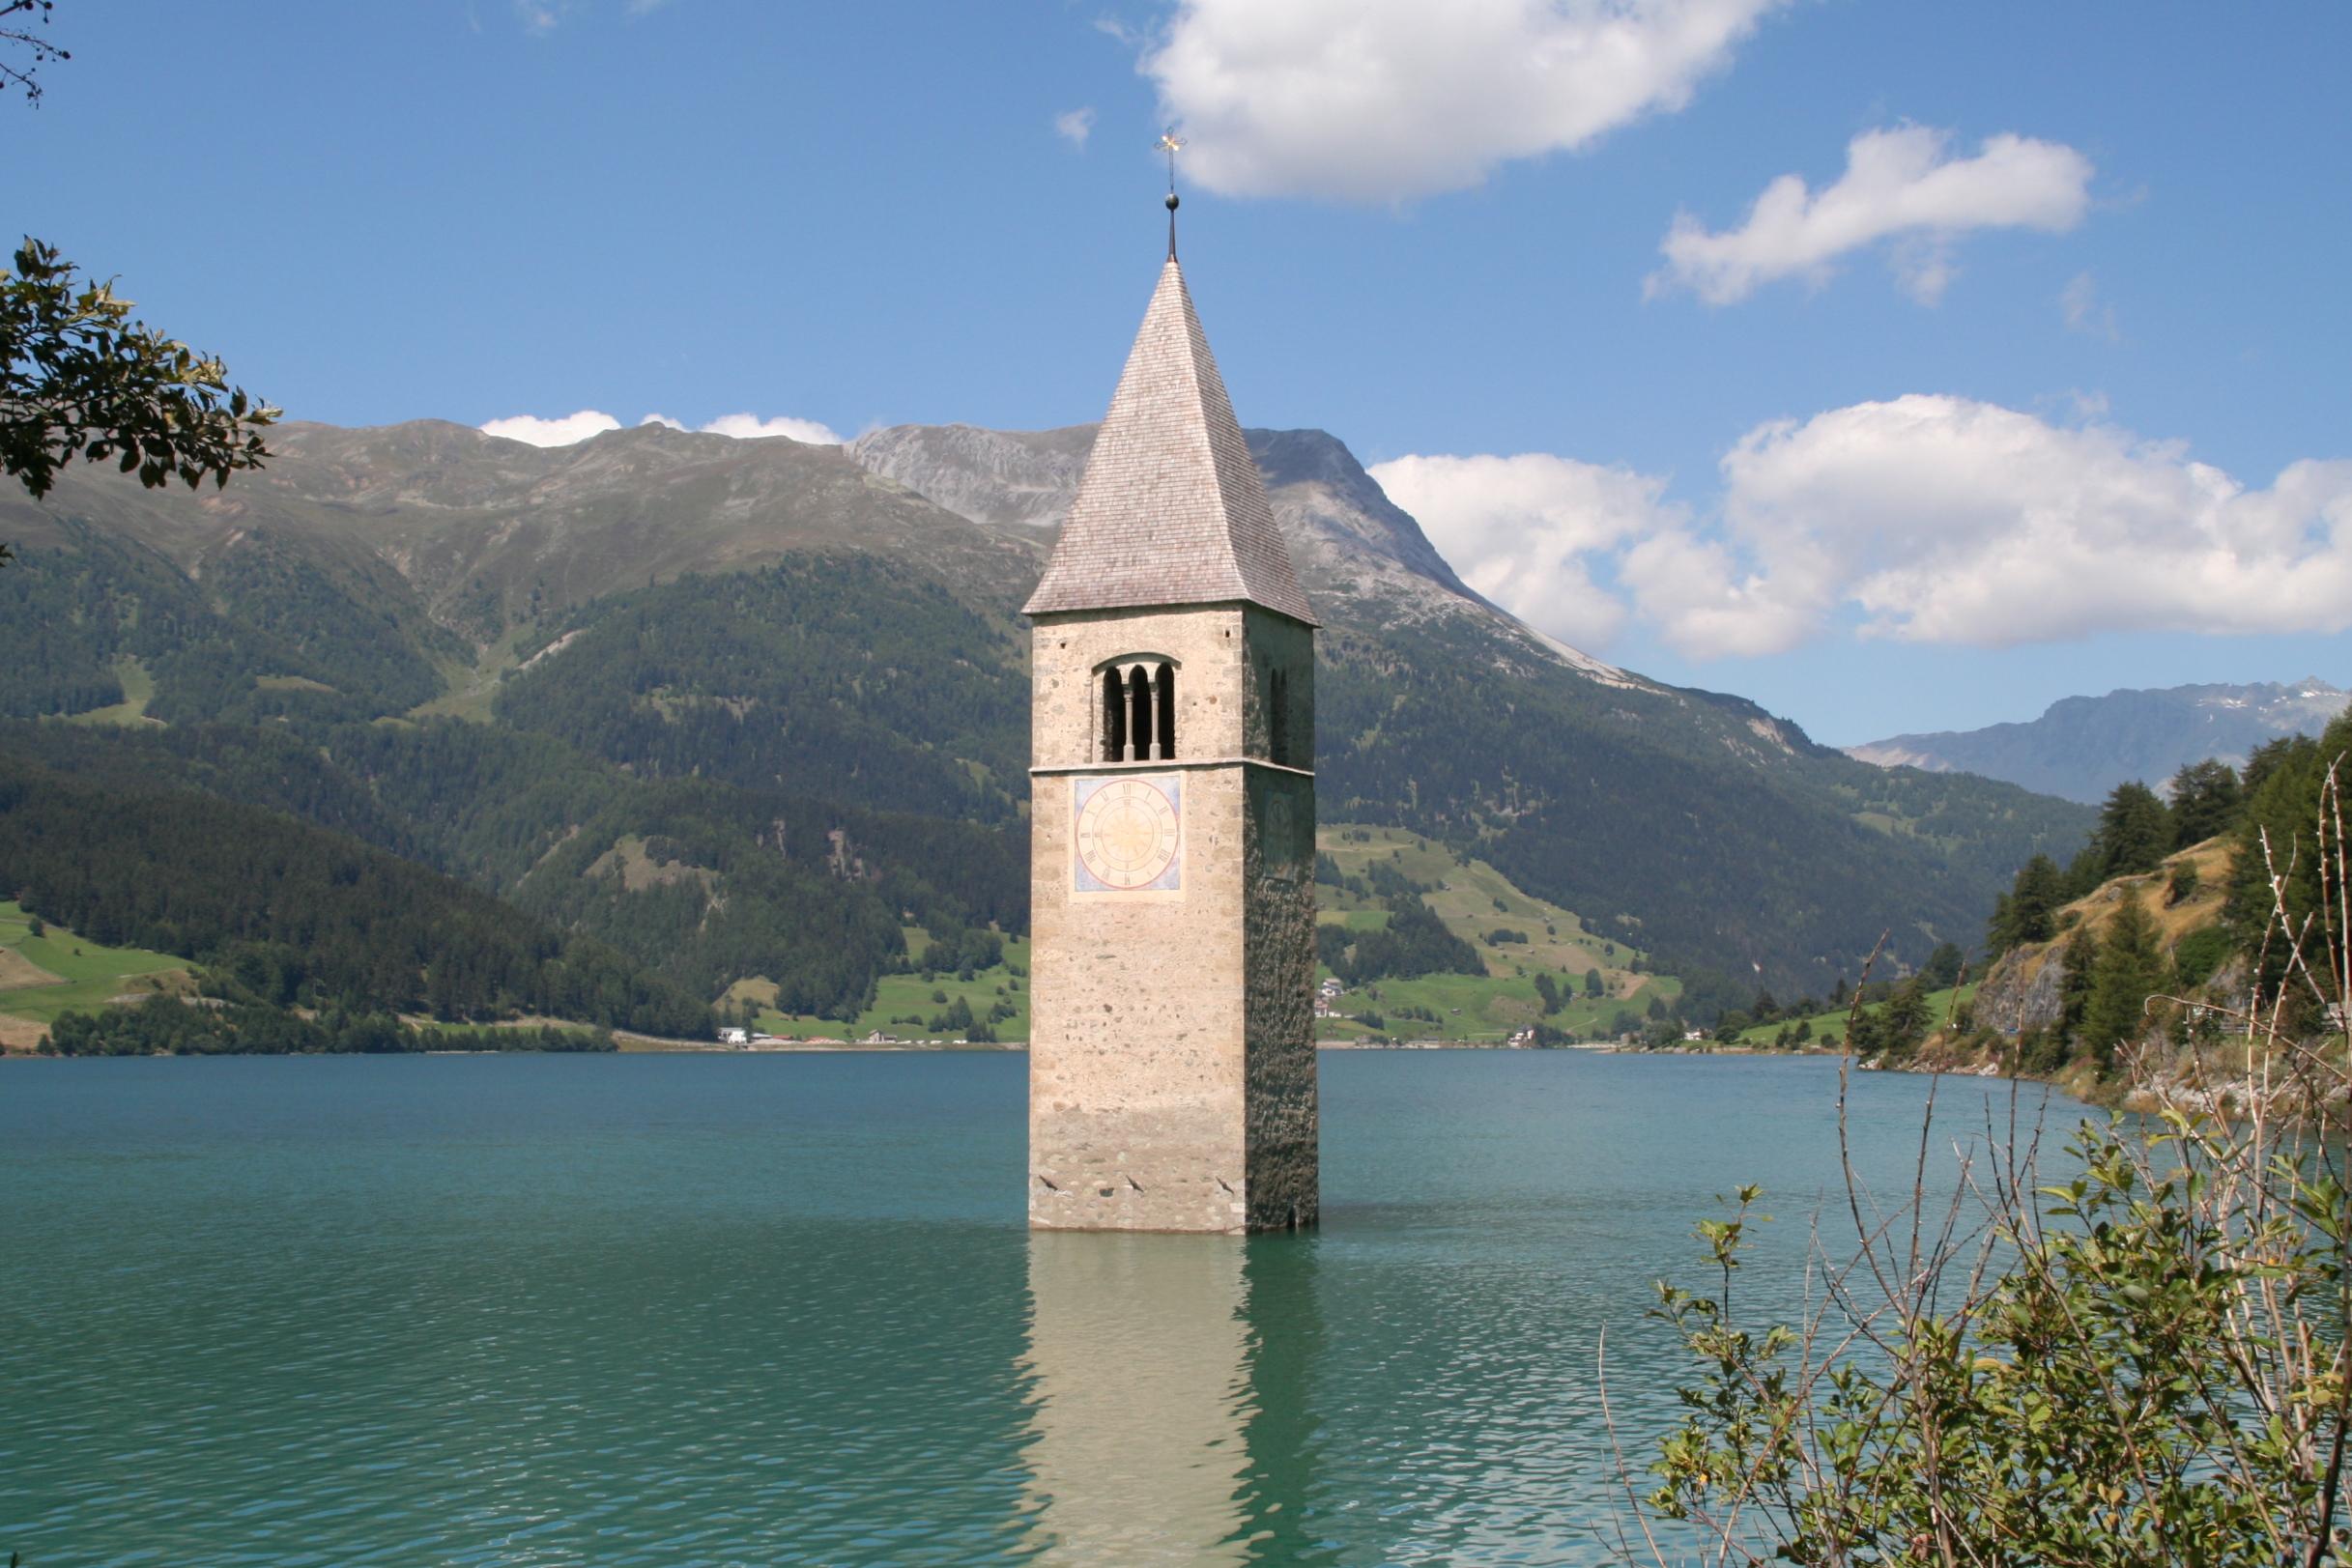 Turm ReschenseeJPG  Wikimedia Commons